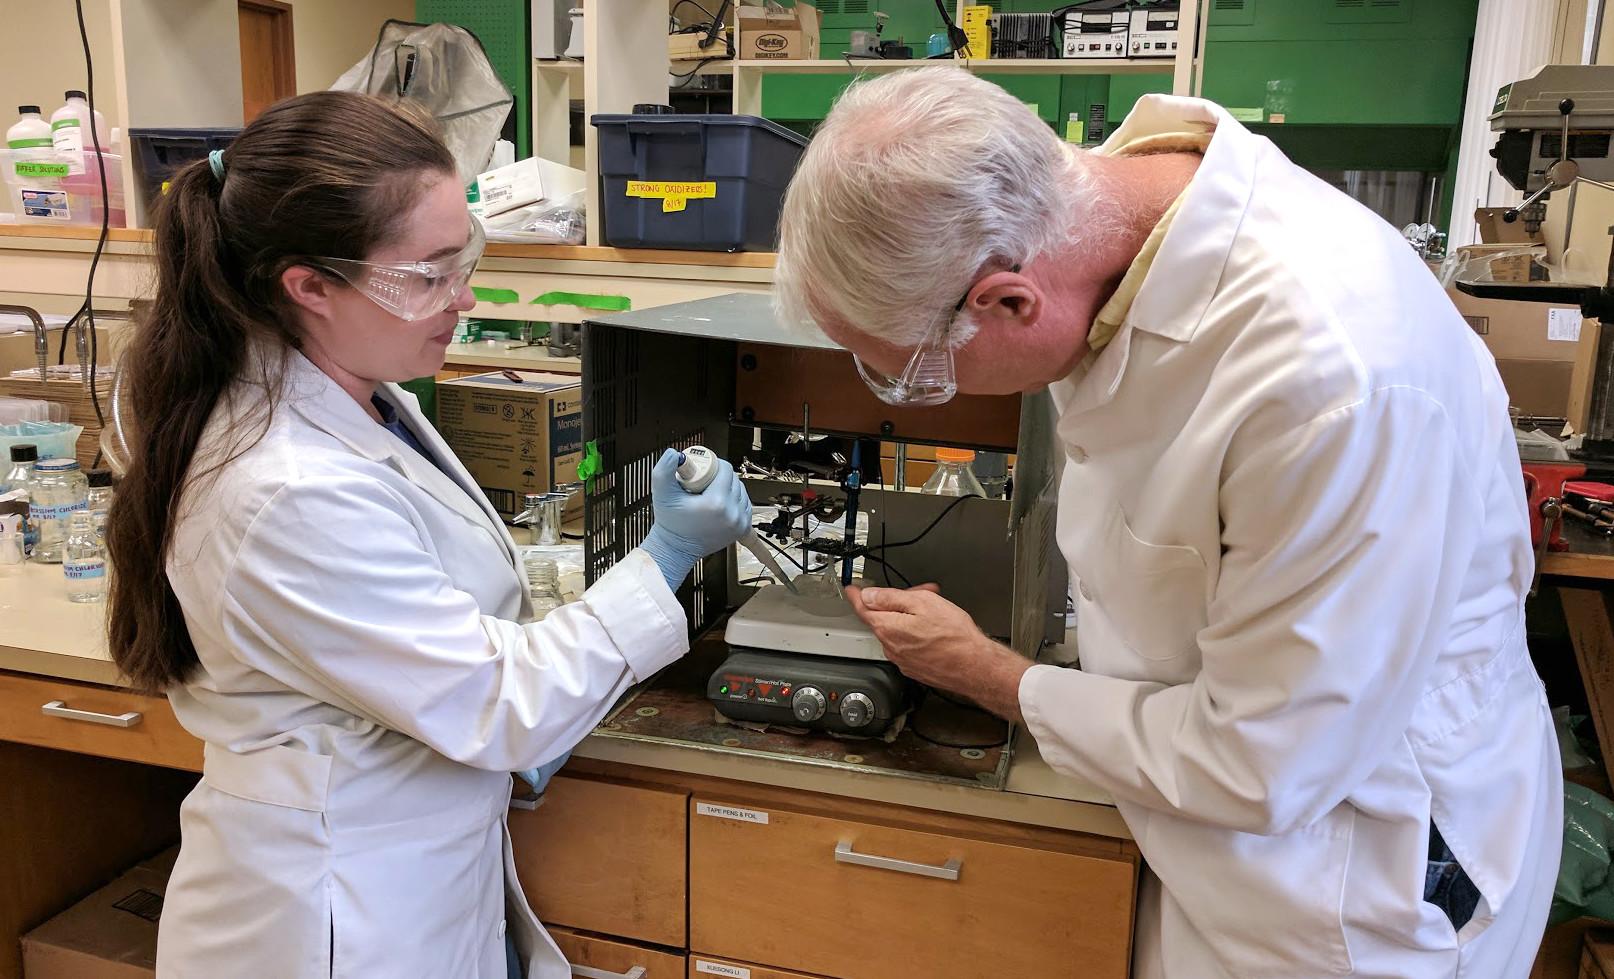 Olivia Ranft and Dr. Bernie Van Wie working in the lab